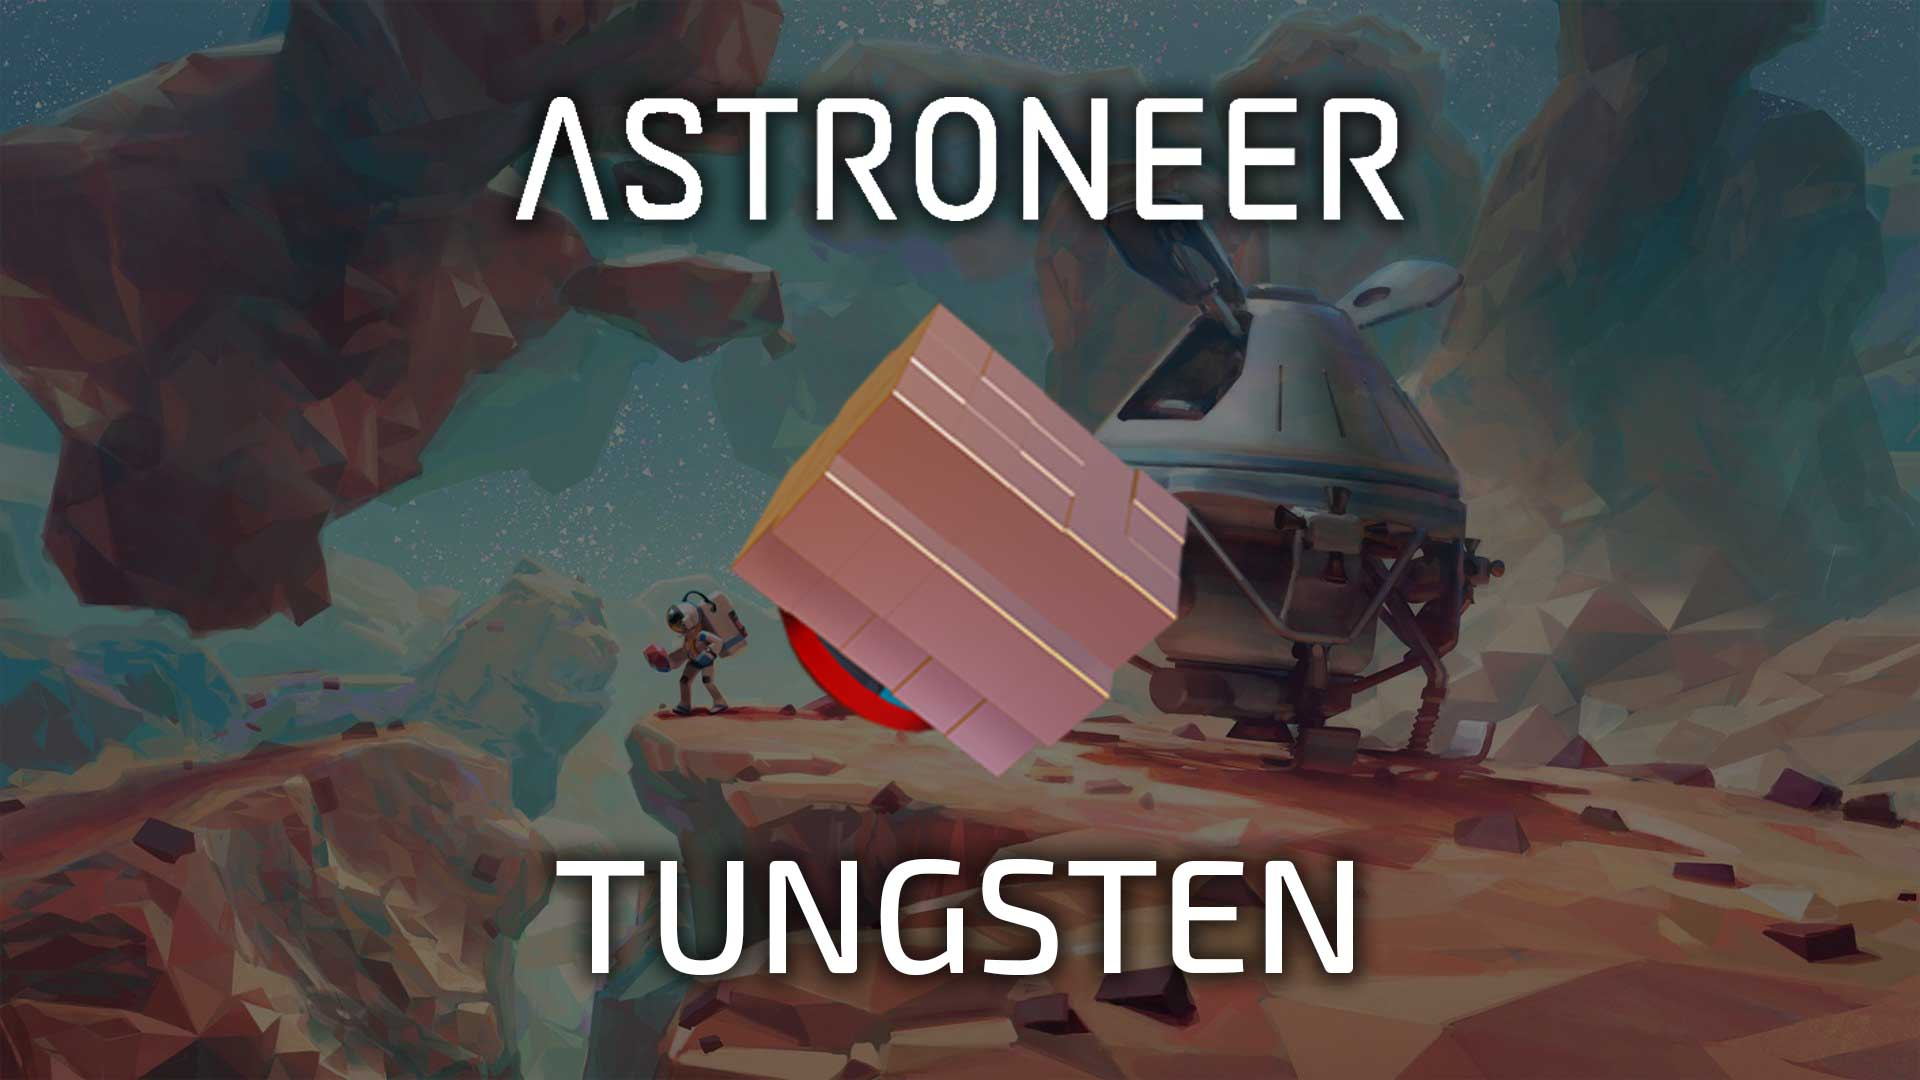 Tungsten in Astroneer